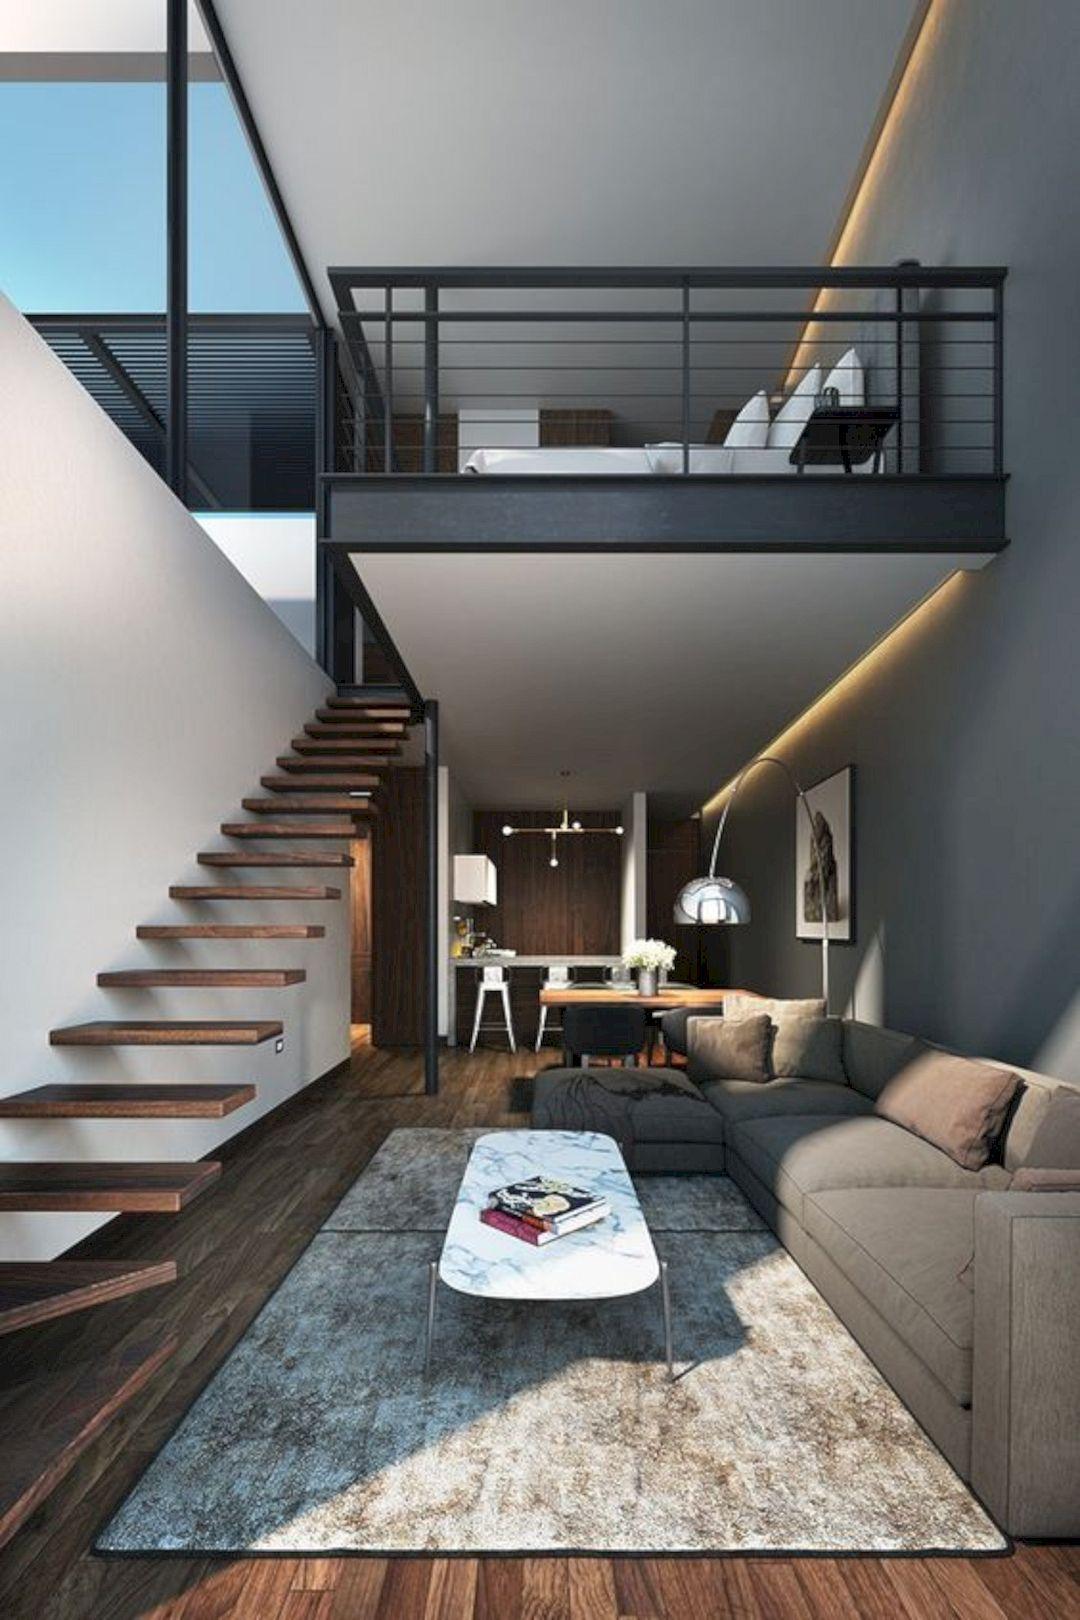 15 Amazing Interior Design Ideas For Modern Loft Interior